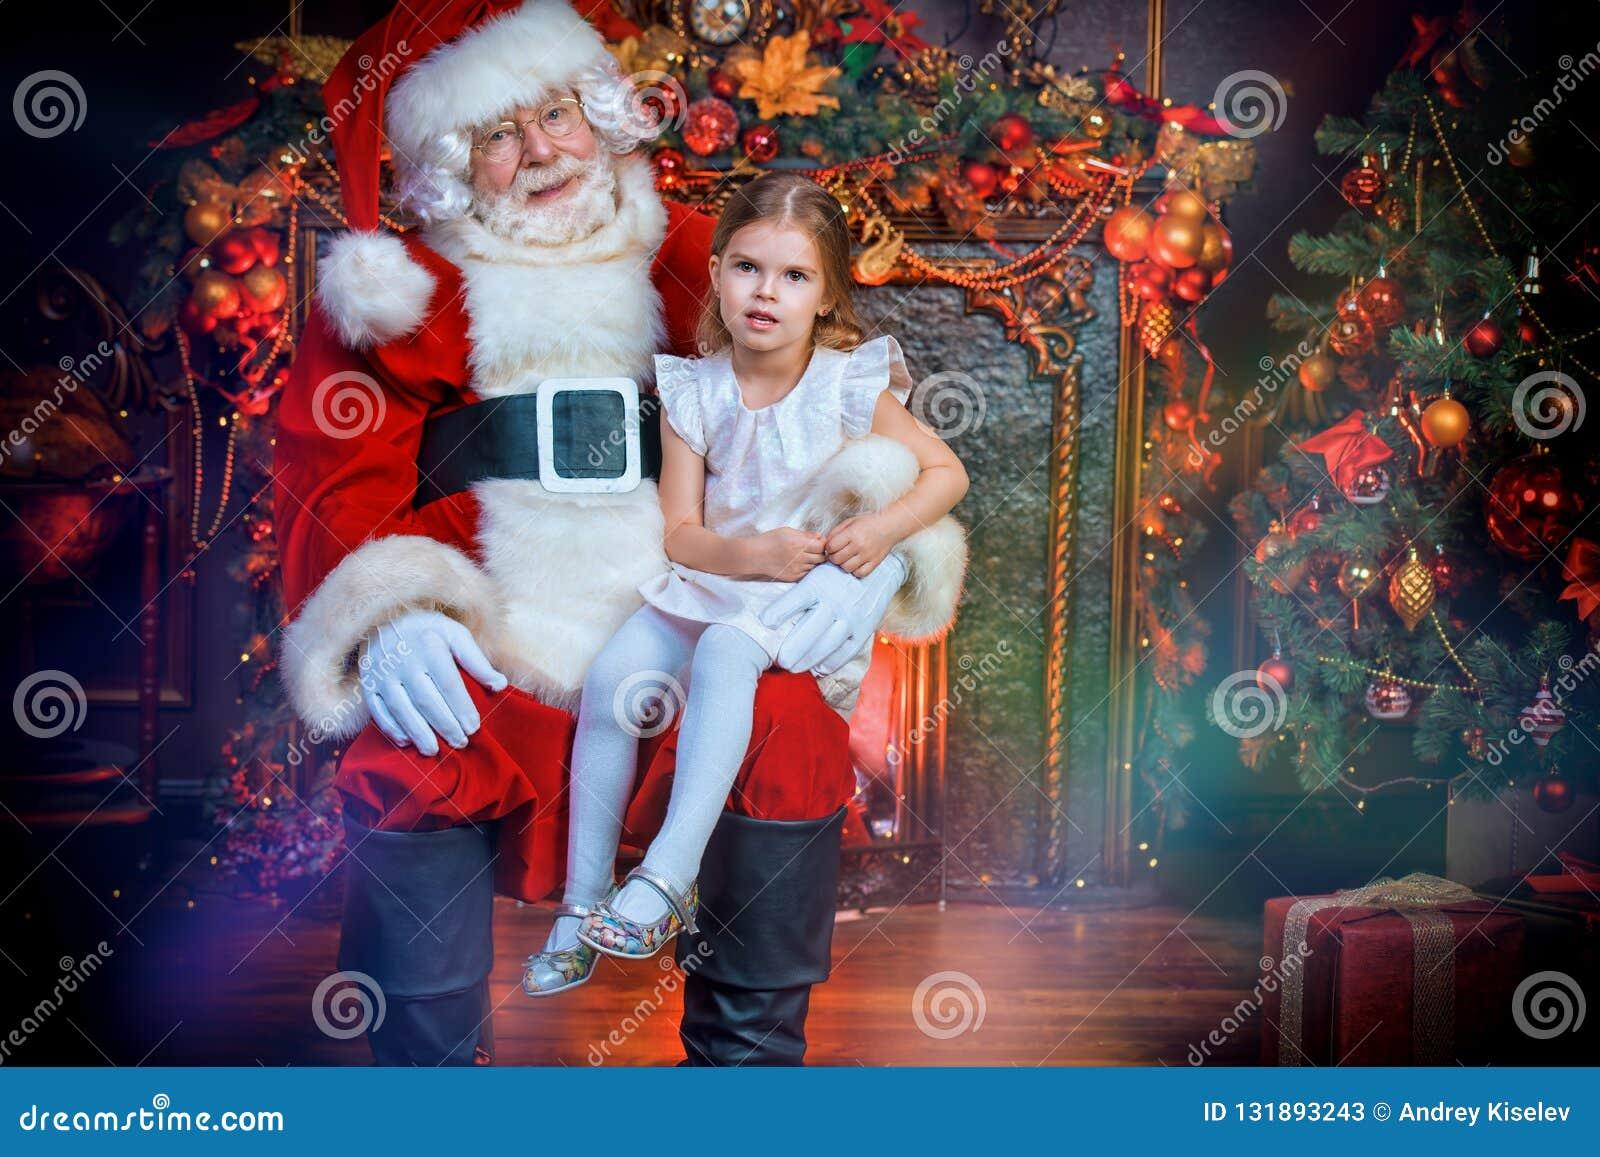 Santa holding a girl